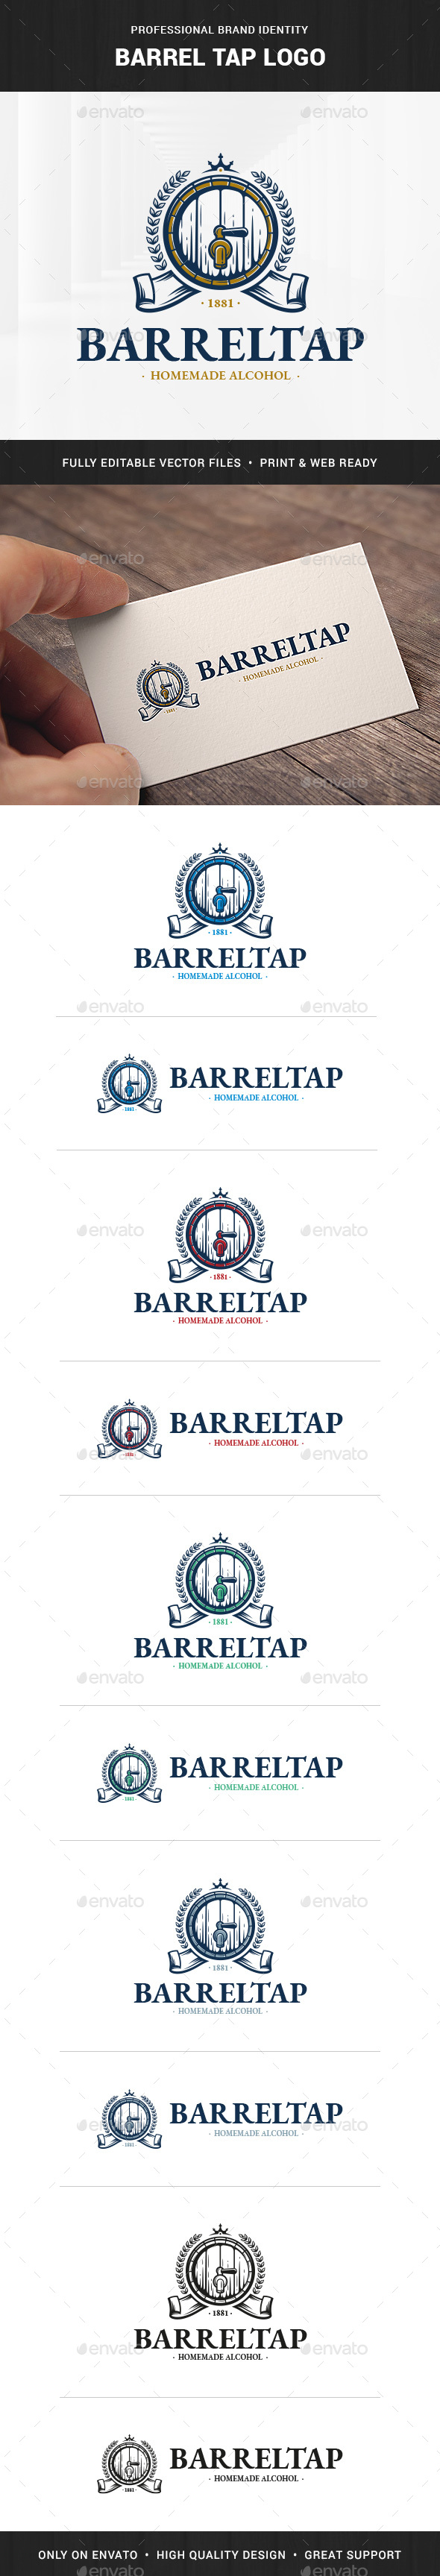 Barrel Tap Logo Template